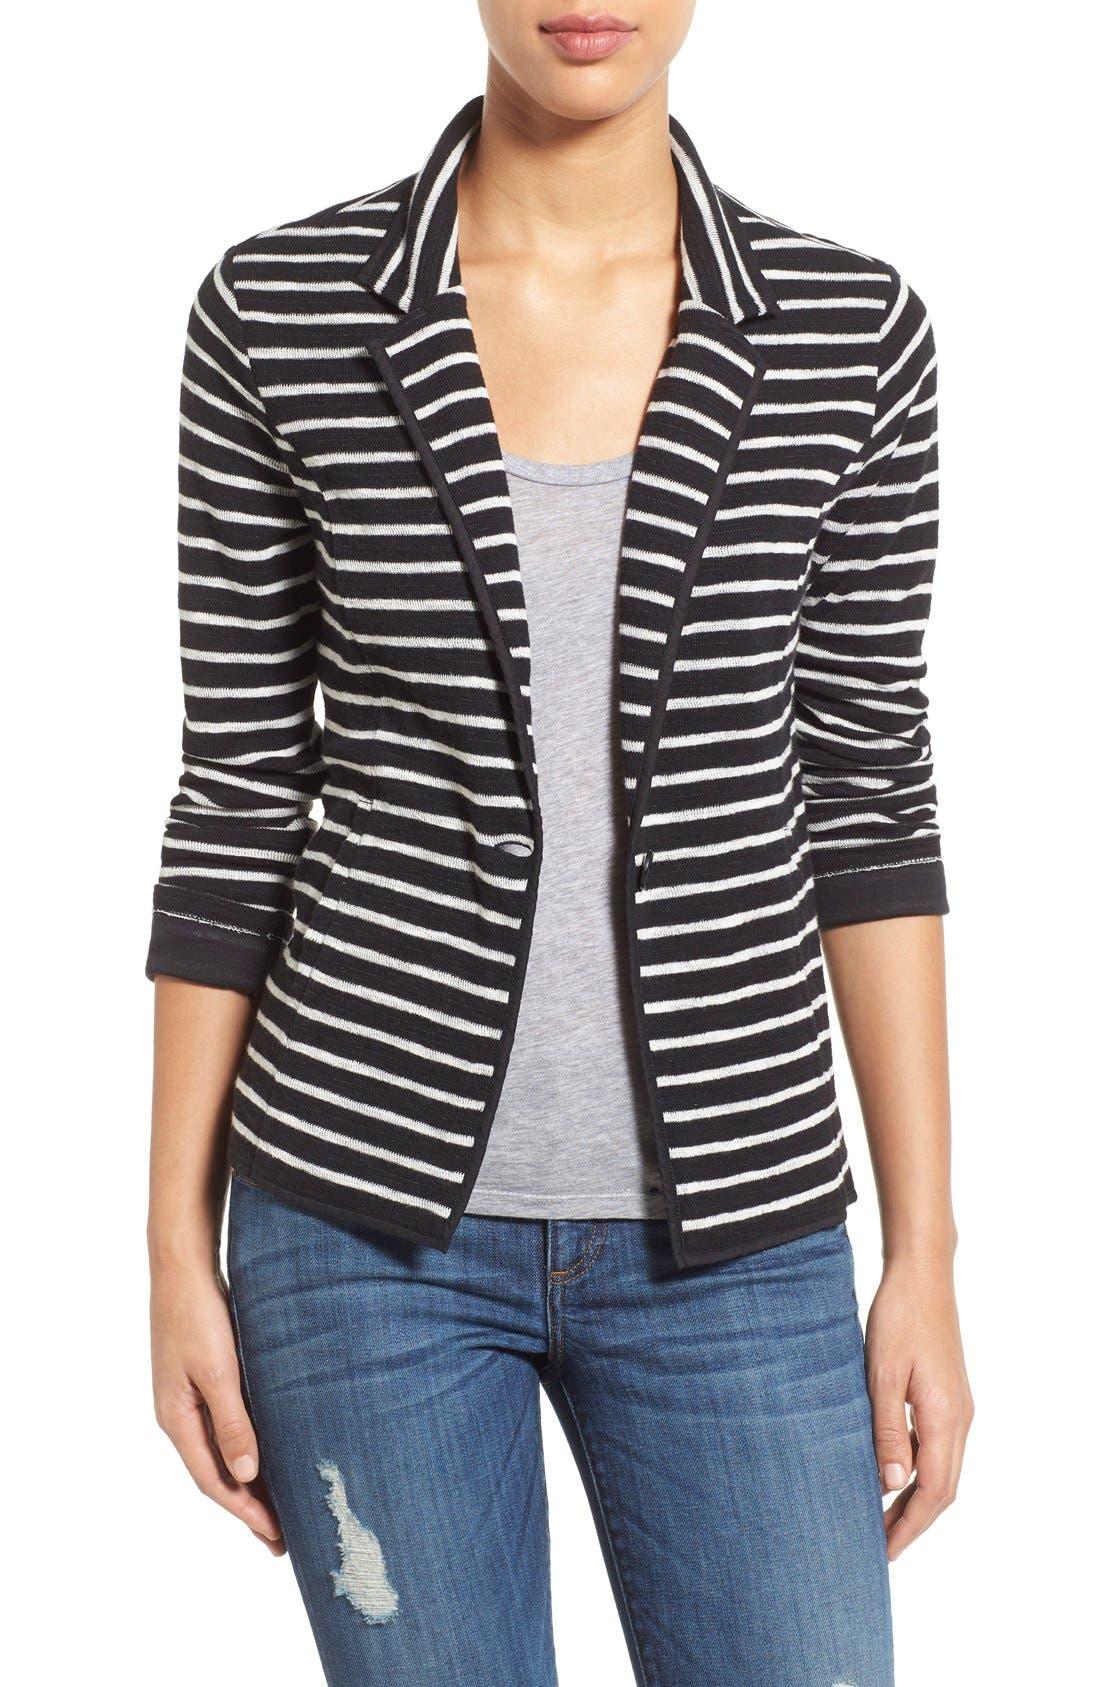 Alternate Image 1 Selected - Caslon® One-Button Knit Blazer (Regular & Petite)